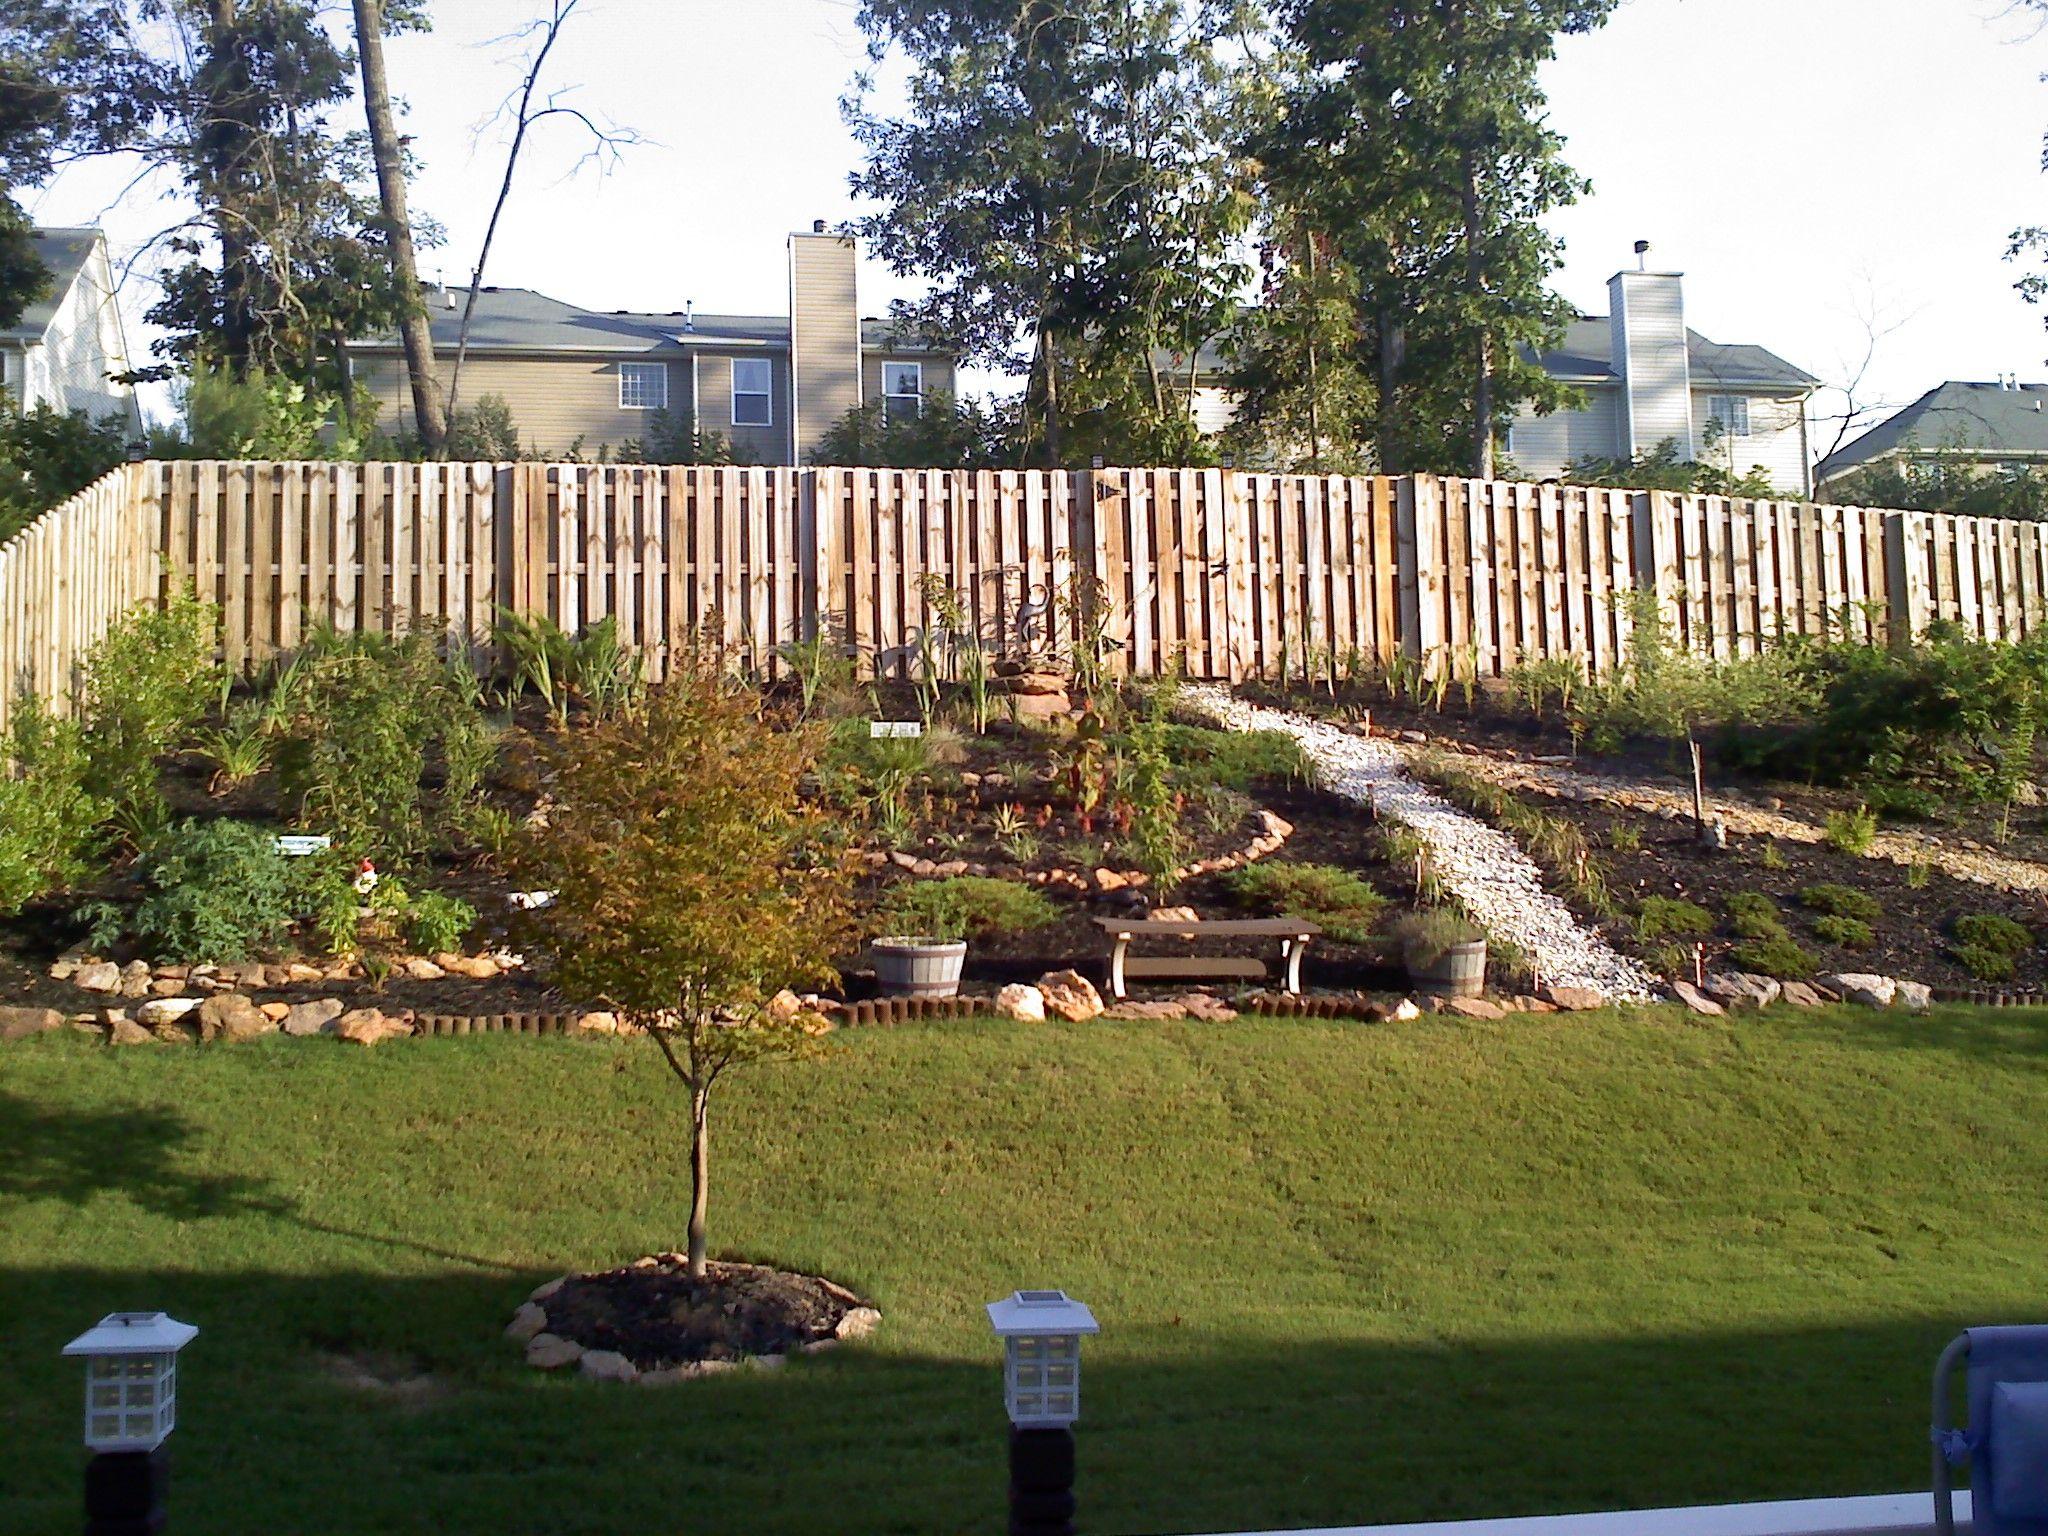 Steep Sloped Back Yard Landscaping Ideas | Should we ...